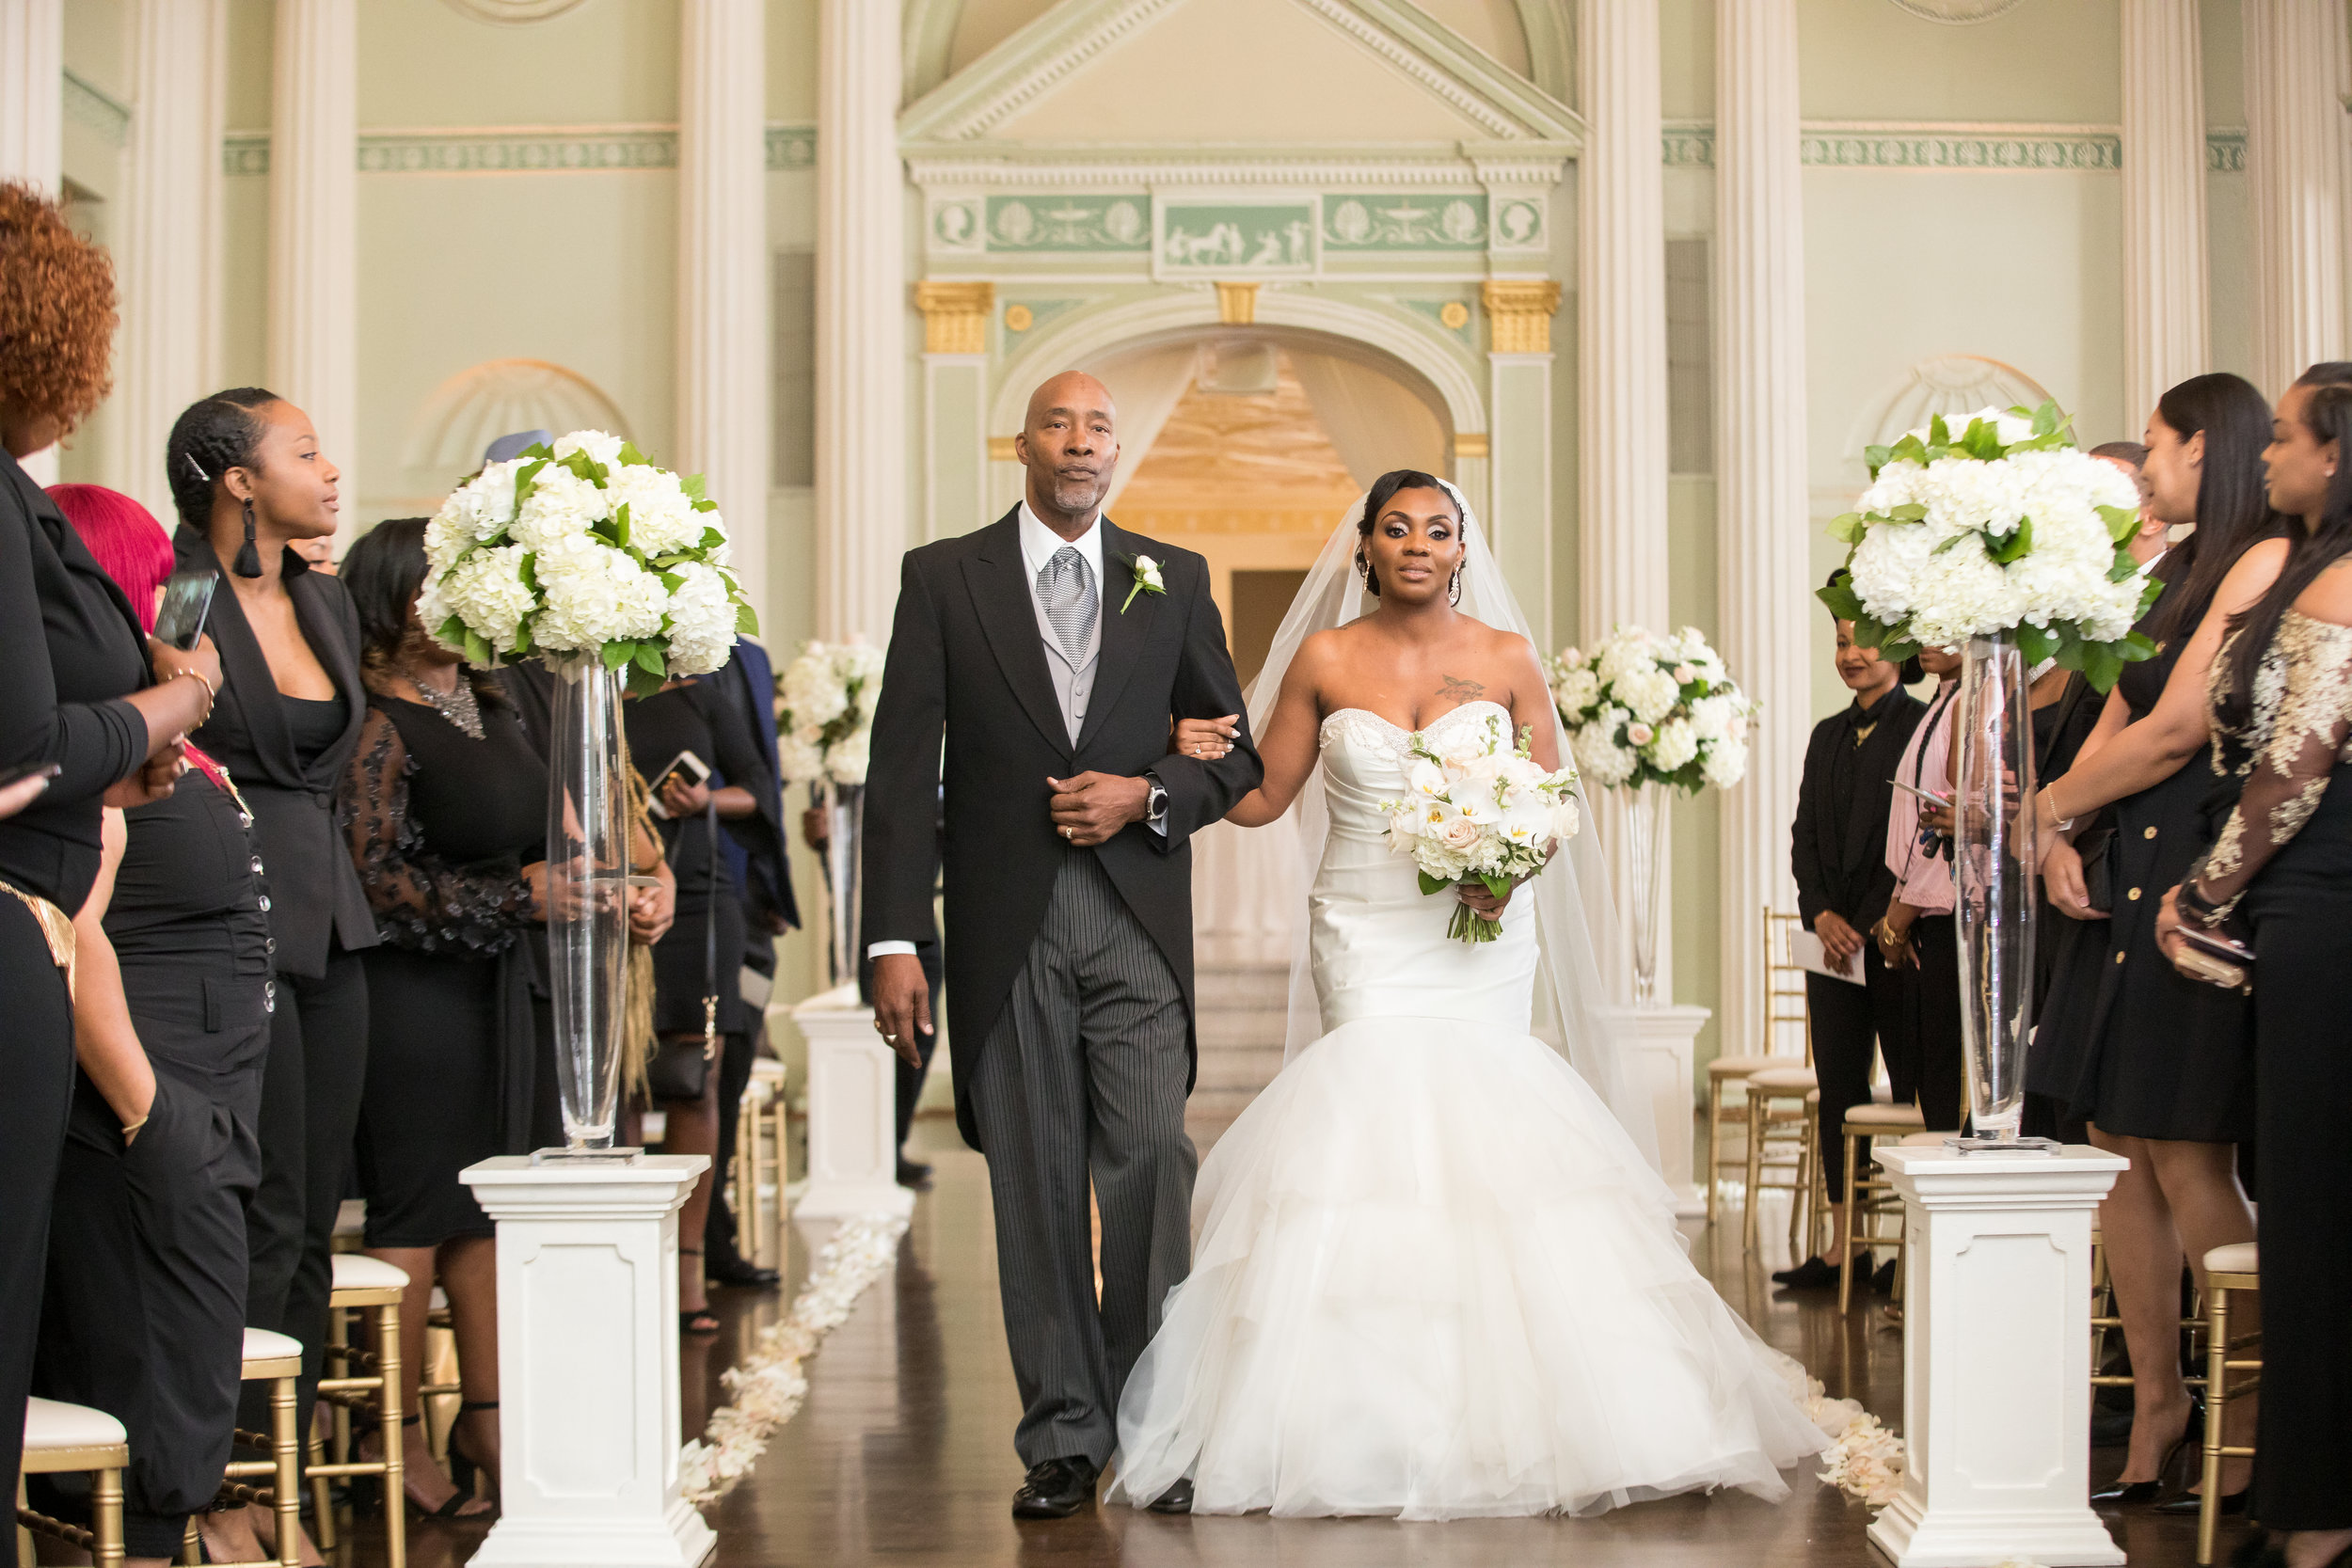 The-Biltmore-Wedding-Rene-Jamison_Cains_Camera_Atlanta_Photography_31.jpg